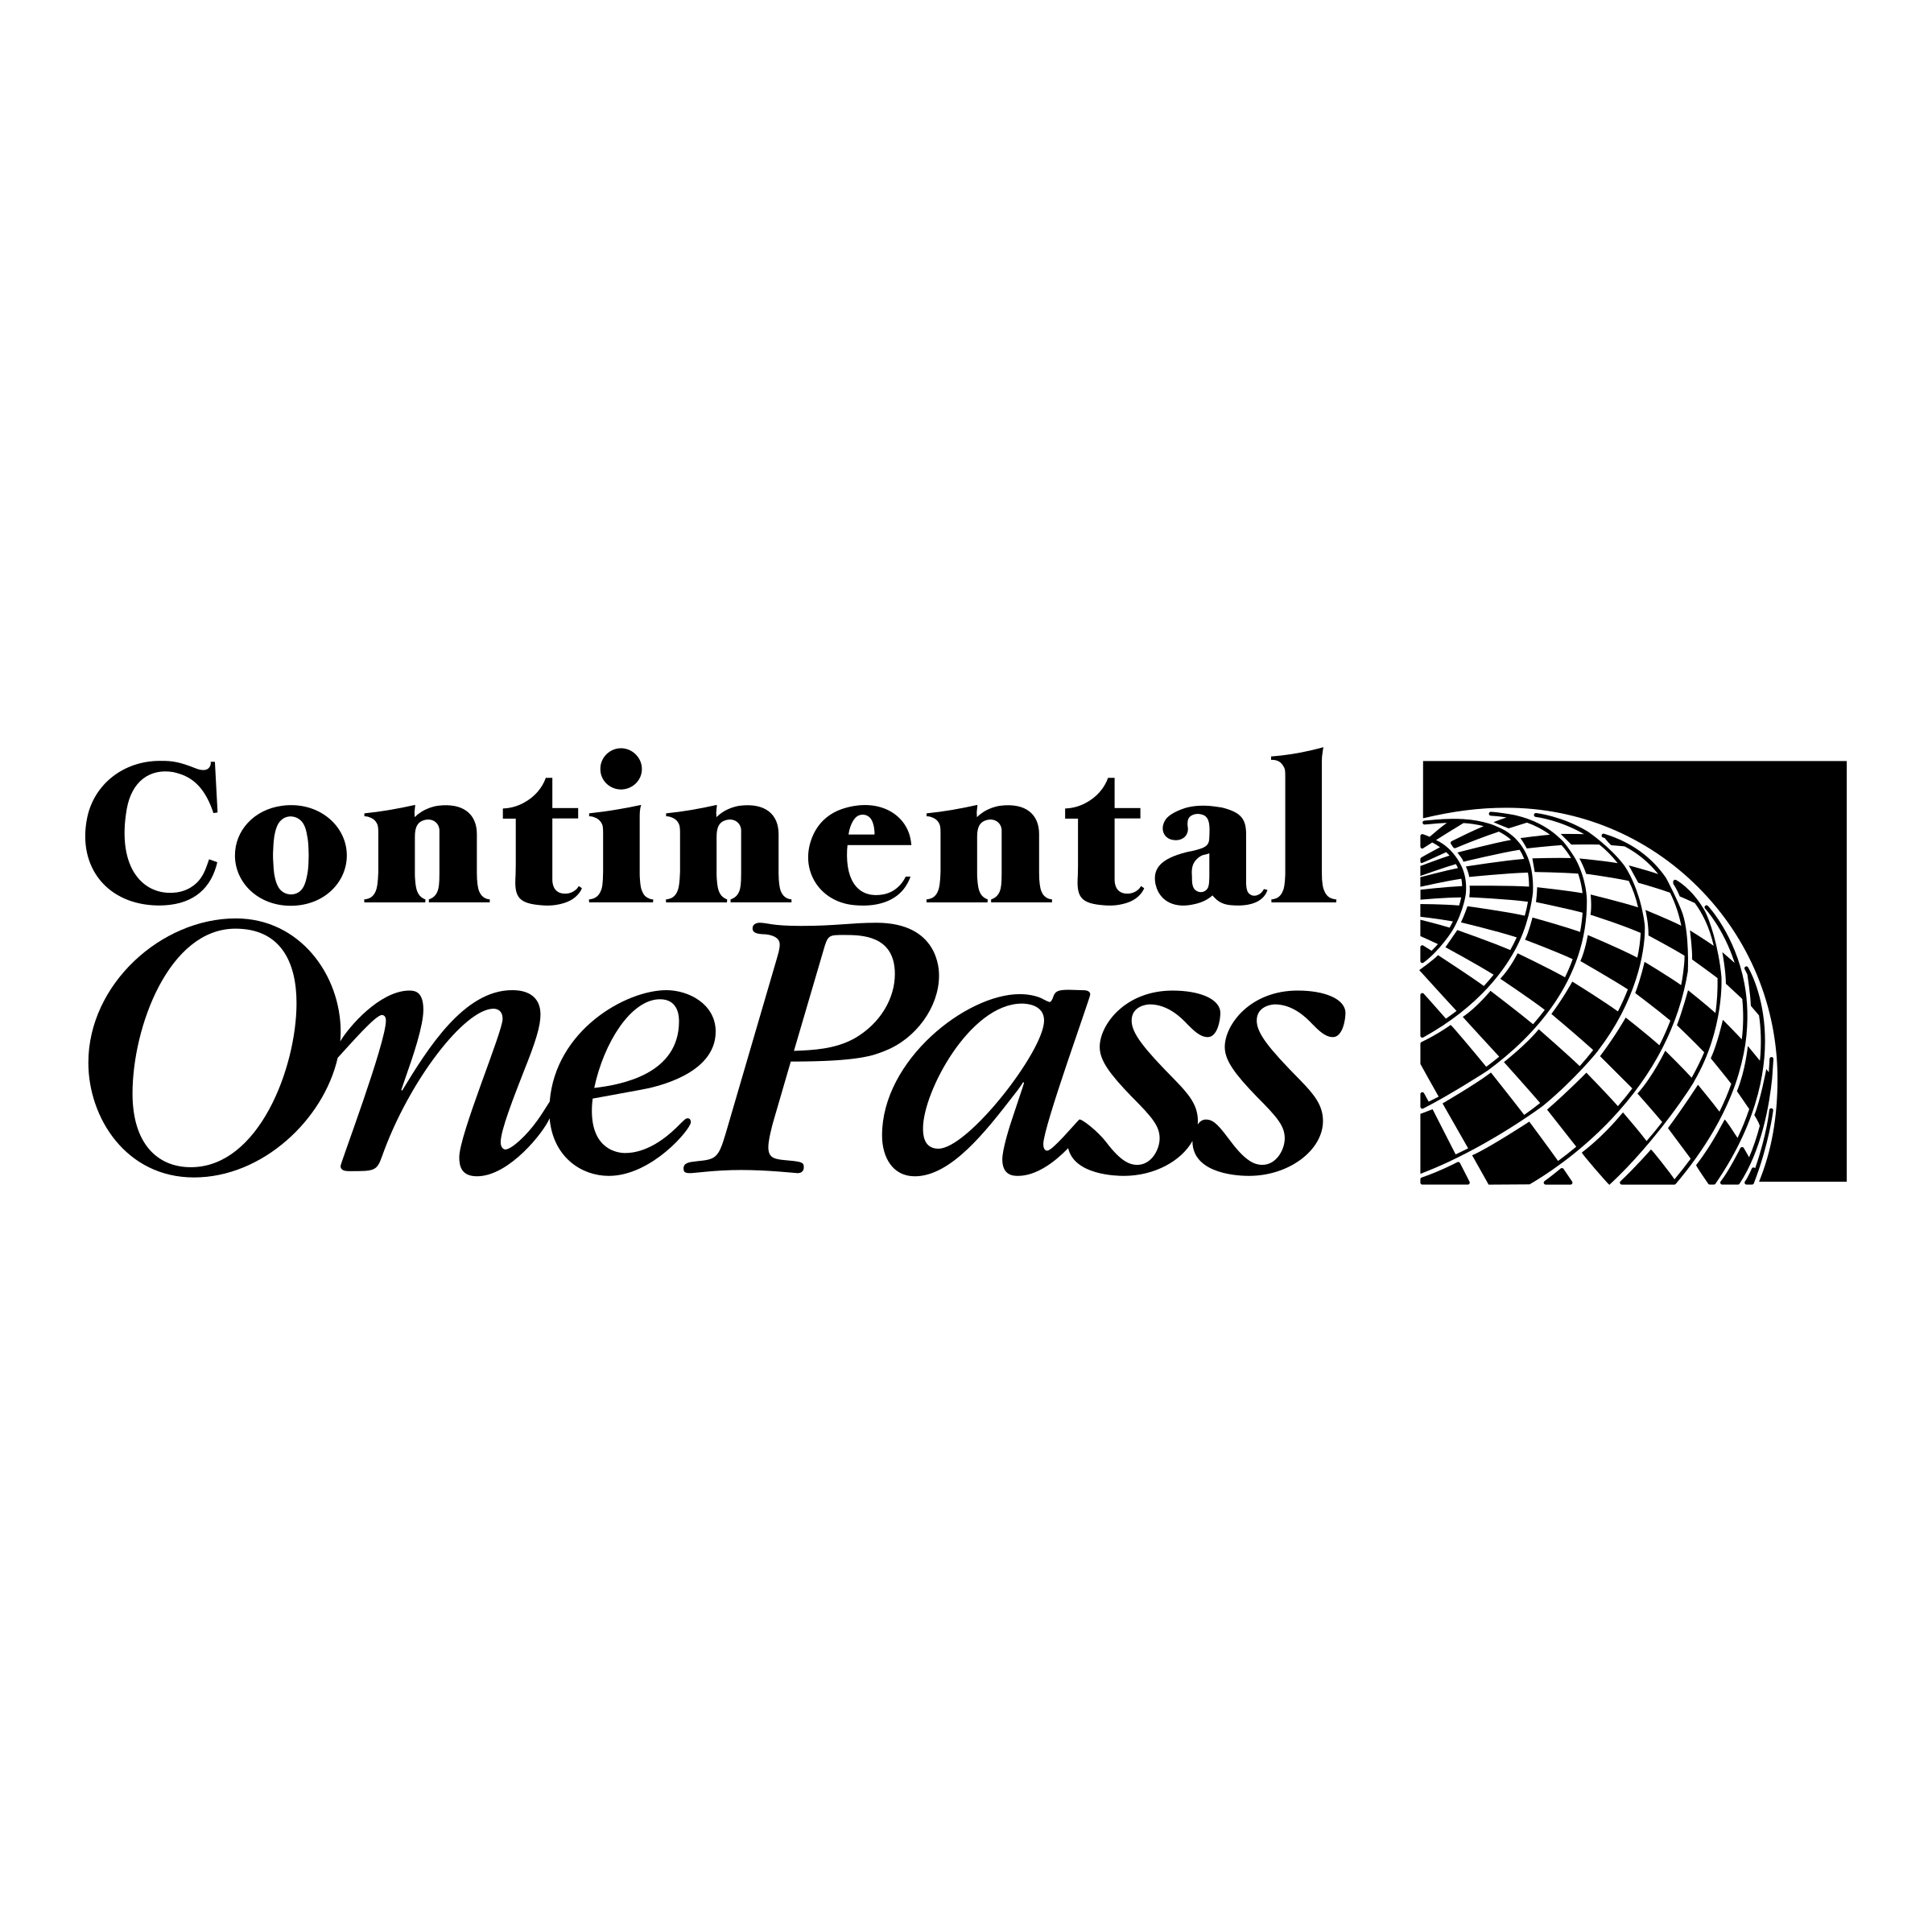 Continental OnePass Logo PNG Transparent & SVG Vector ...